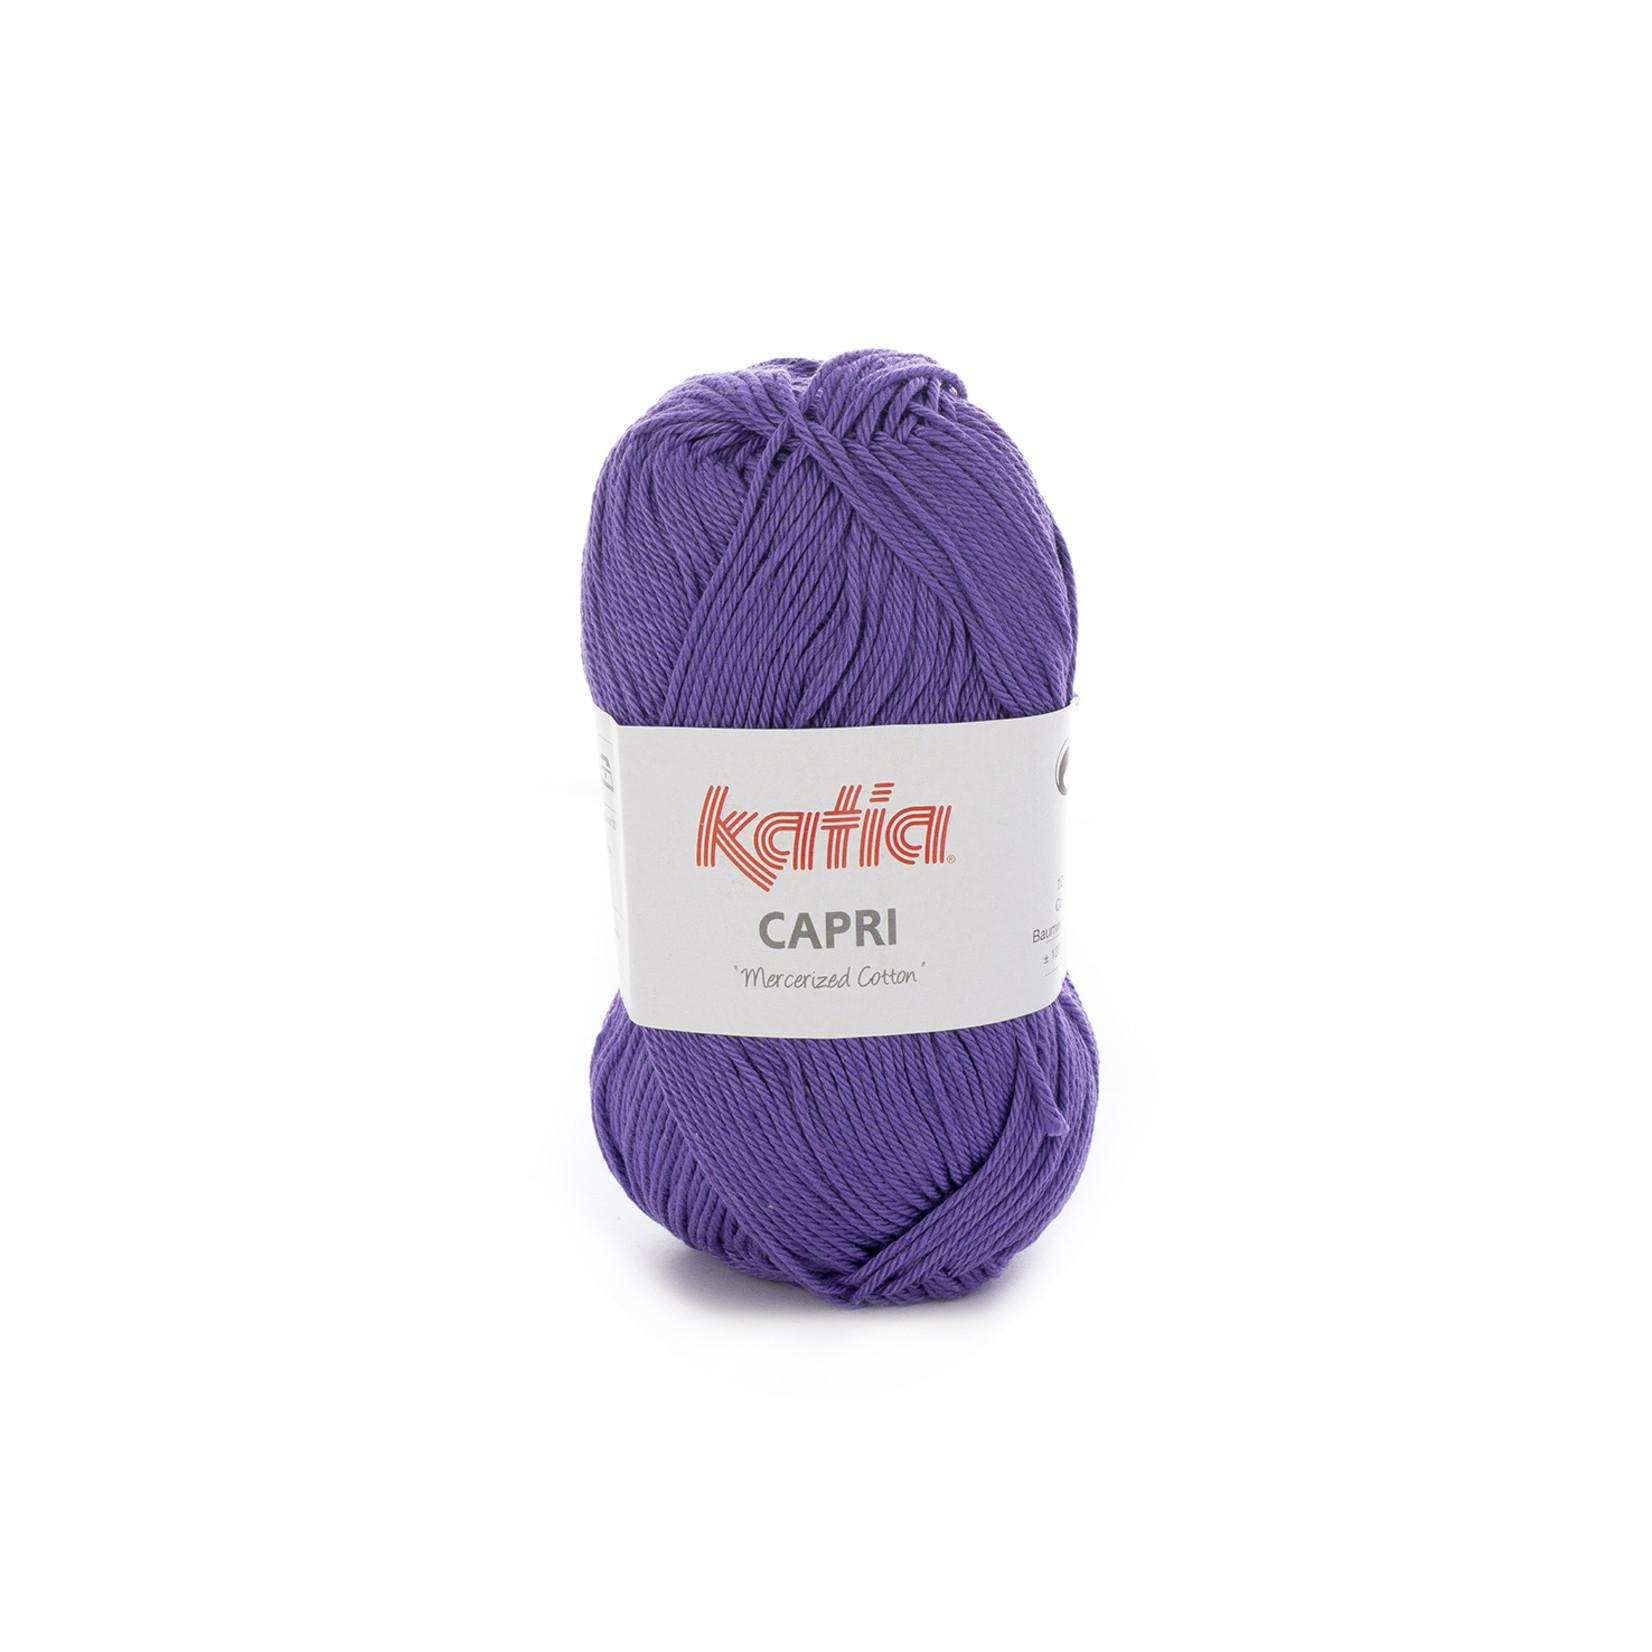 Katia Katia Capri - kleur 131 Donkerlila - 50 gr. = 125 m. - 100% katoen